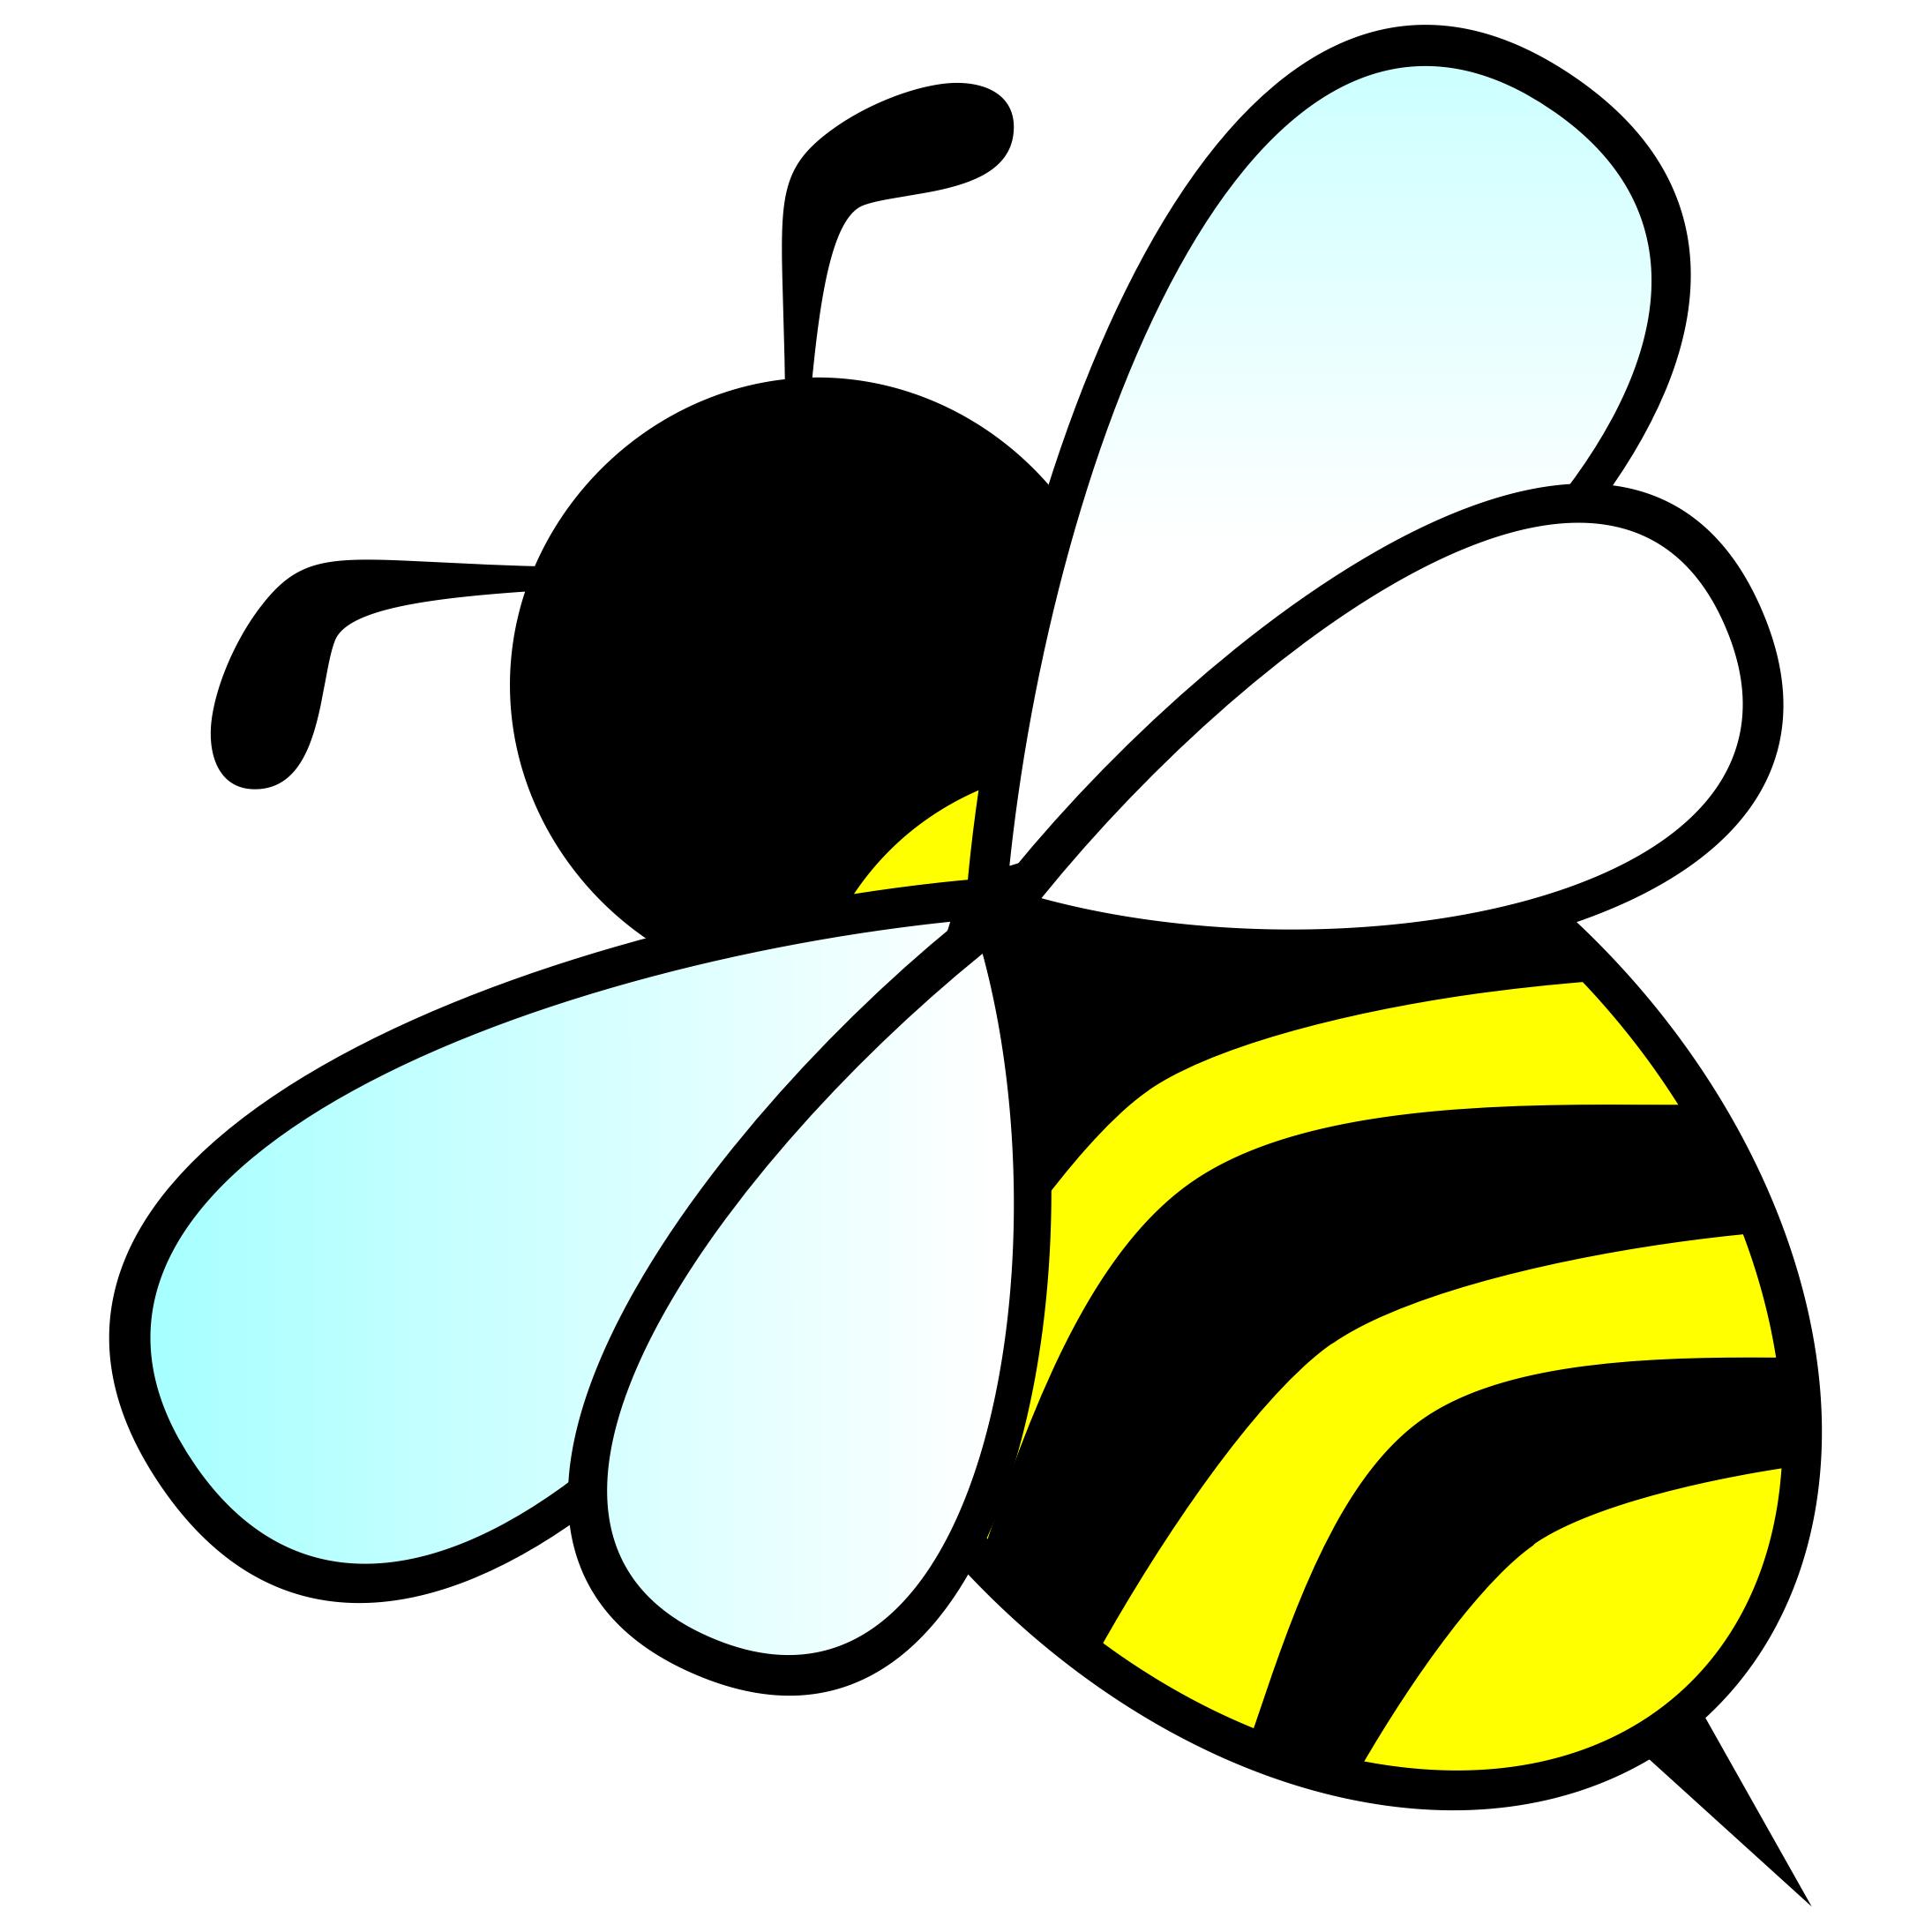 Bumble Bee Clip Art #40566 - Bumble Bee Clipart